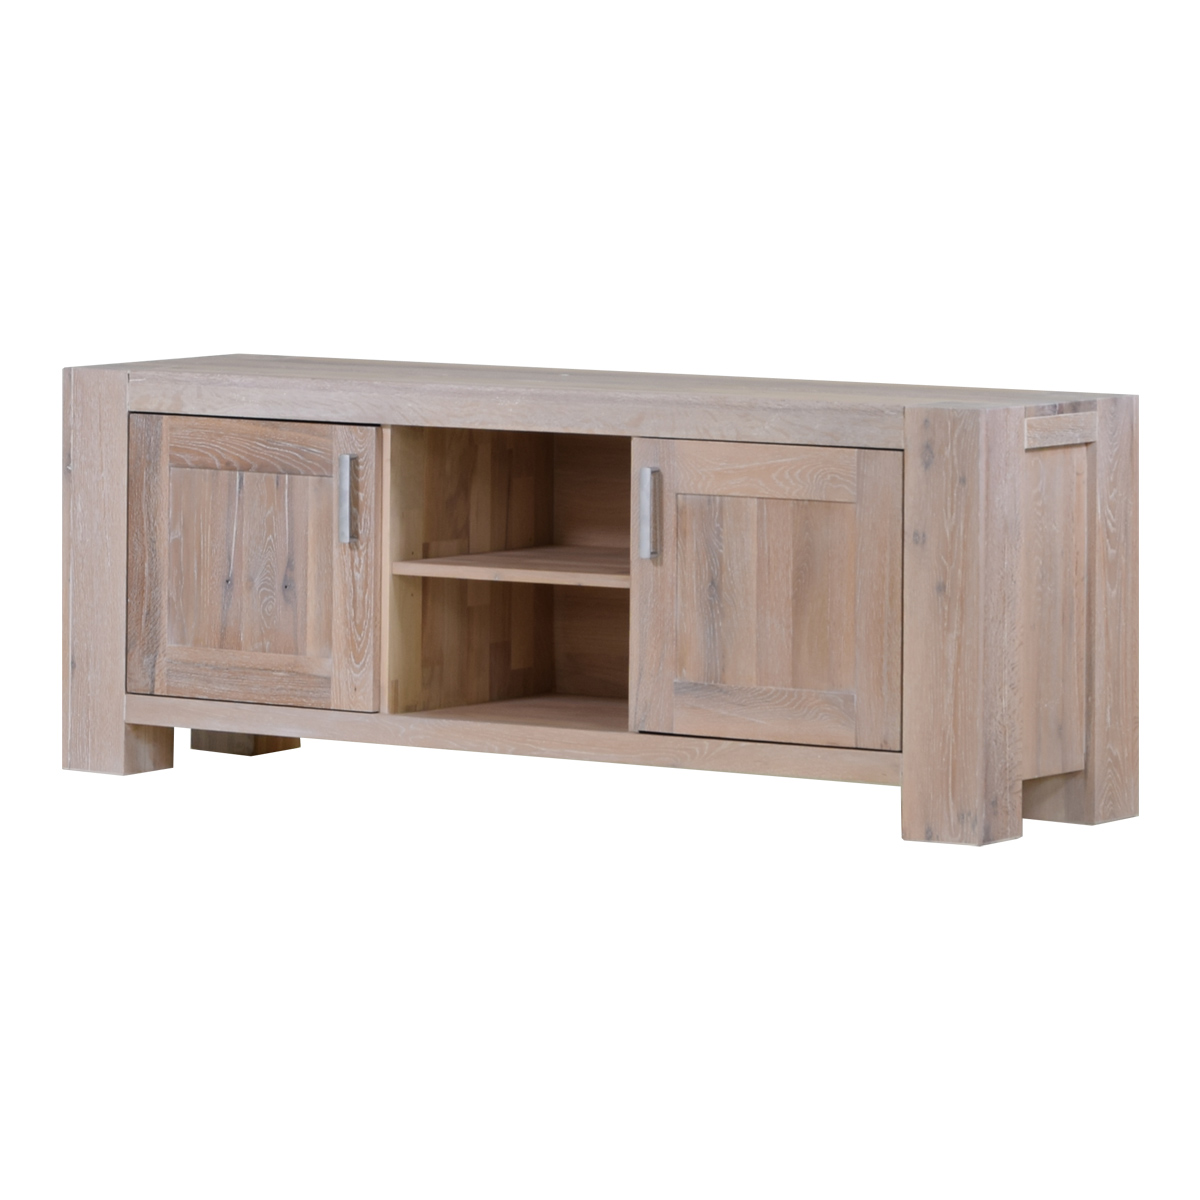 sideboard massivholz wei beautiful sideboard akazie massivholz wei braun cm kommode anrichte im. Black Bedroom Furniture Sets. Home Design Ideas